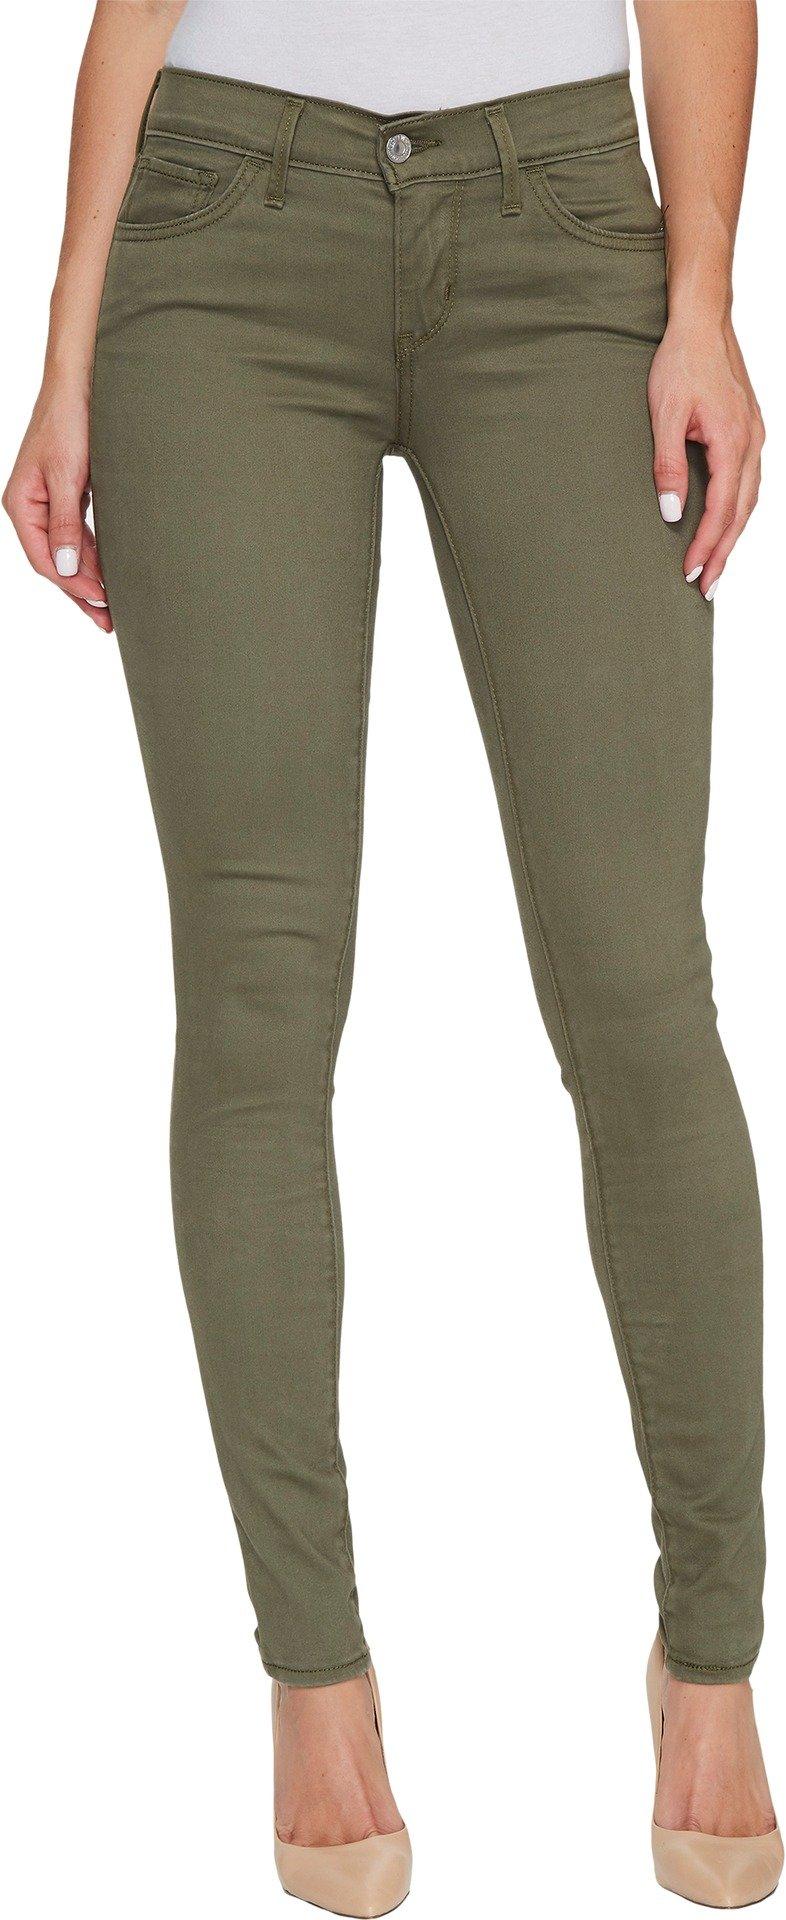 Levi's Women's 710 Super Skinny Jeans, Super Soft Kalamata, 26 (US 2) R